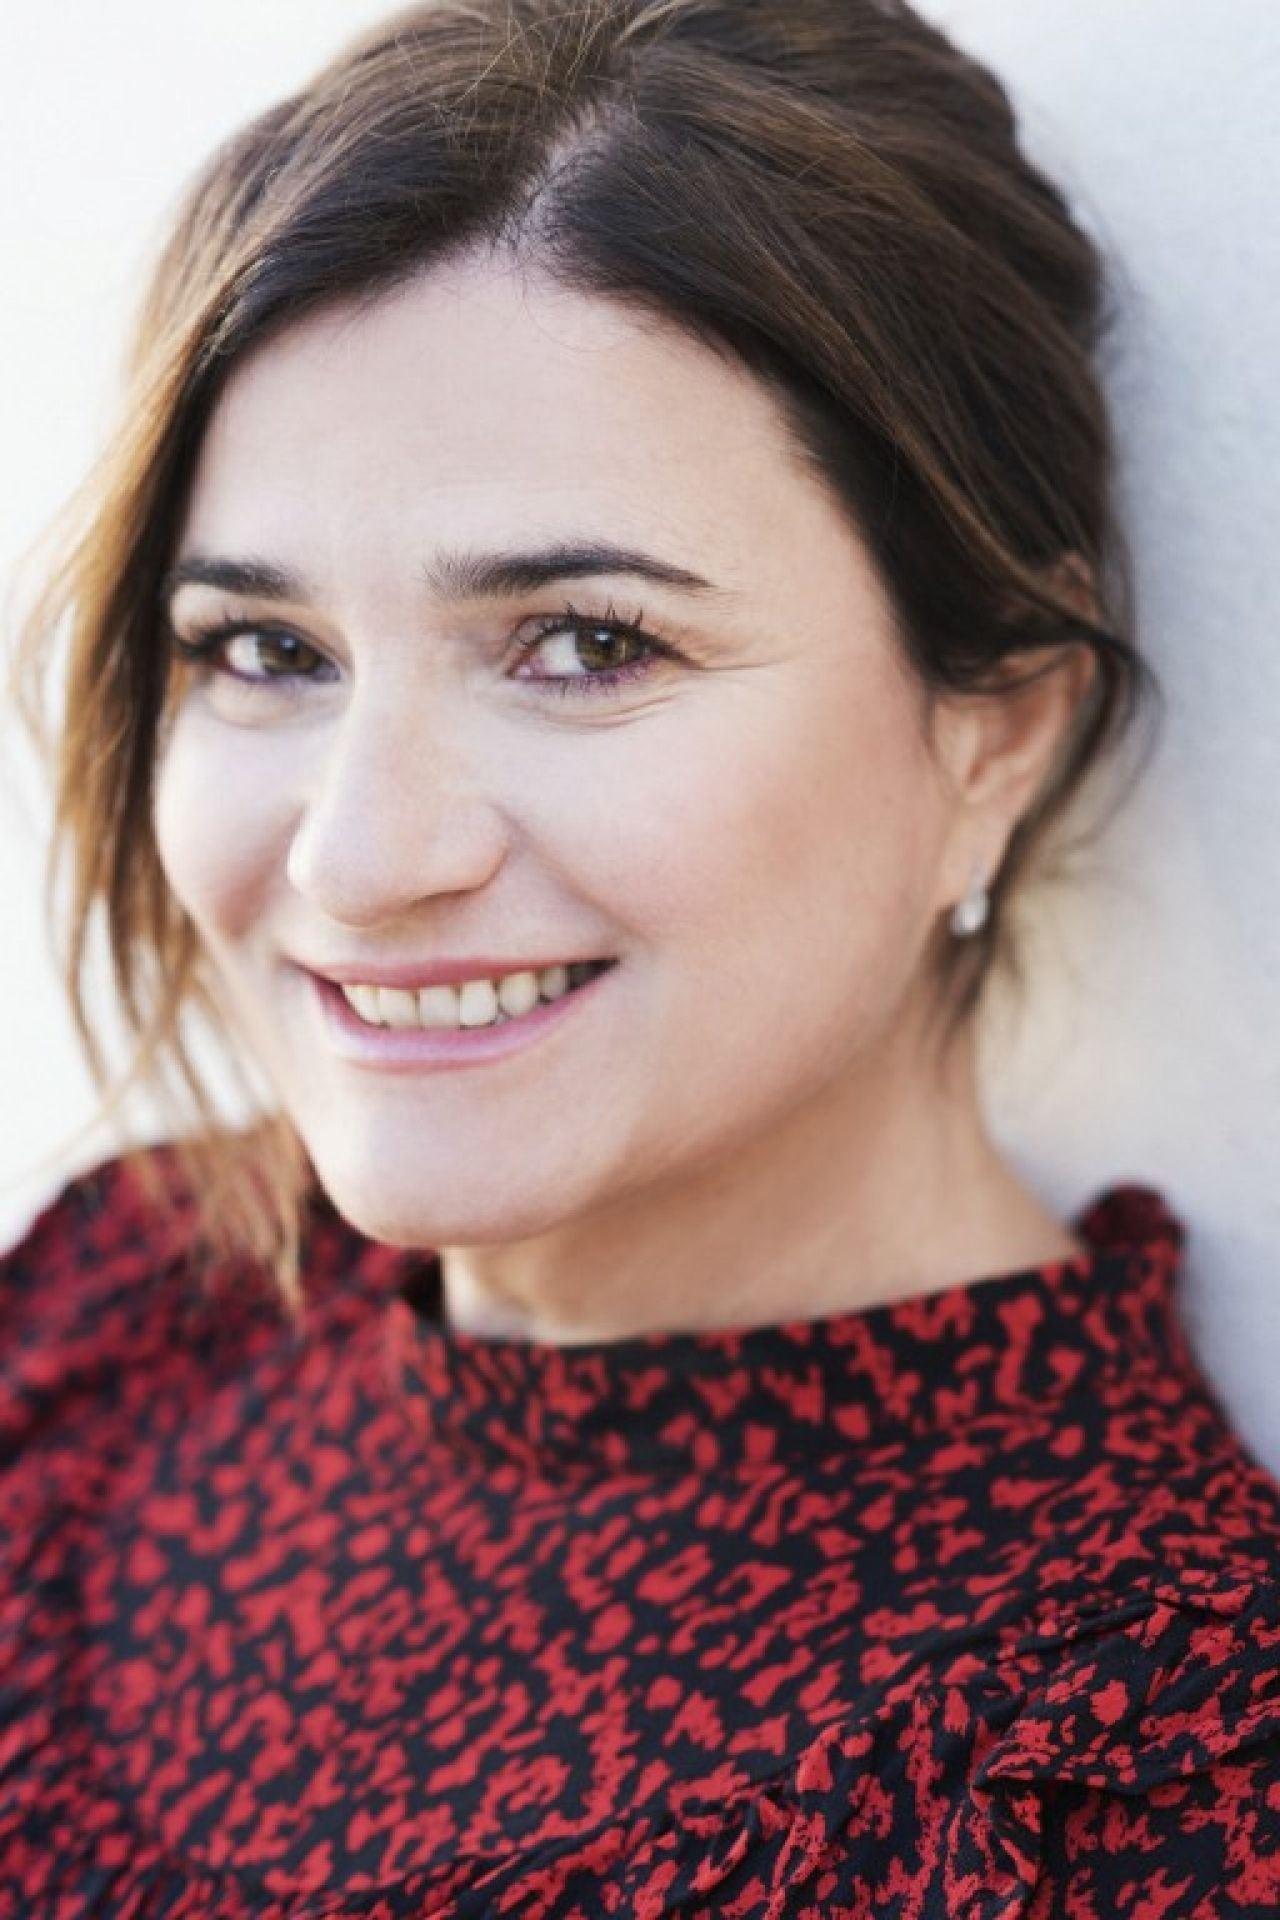 Francesca Haydee Borelli